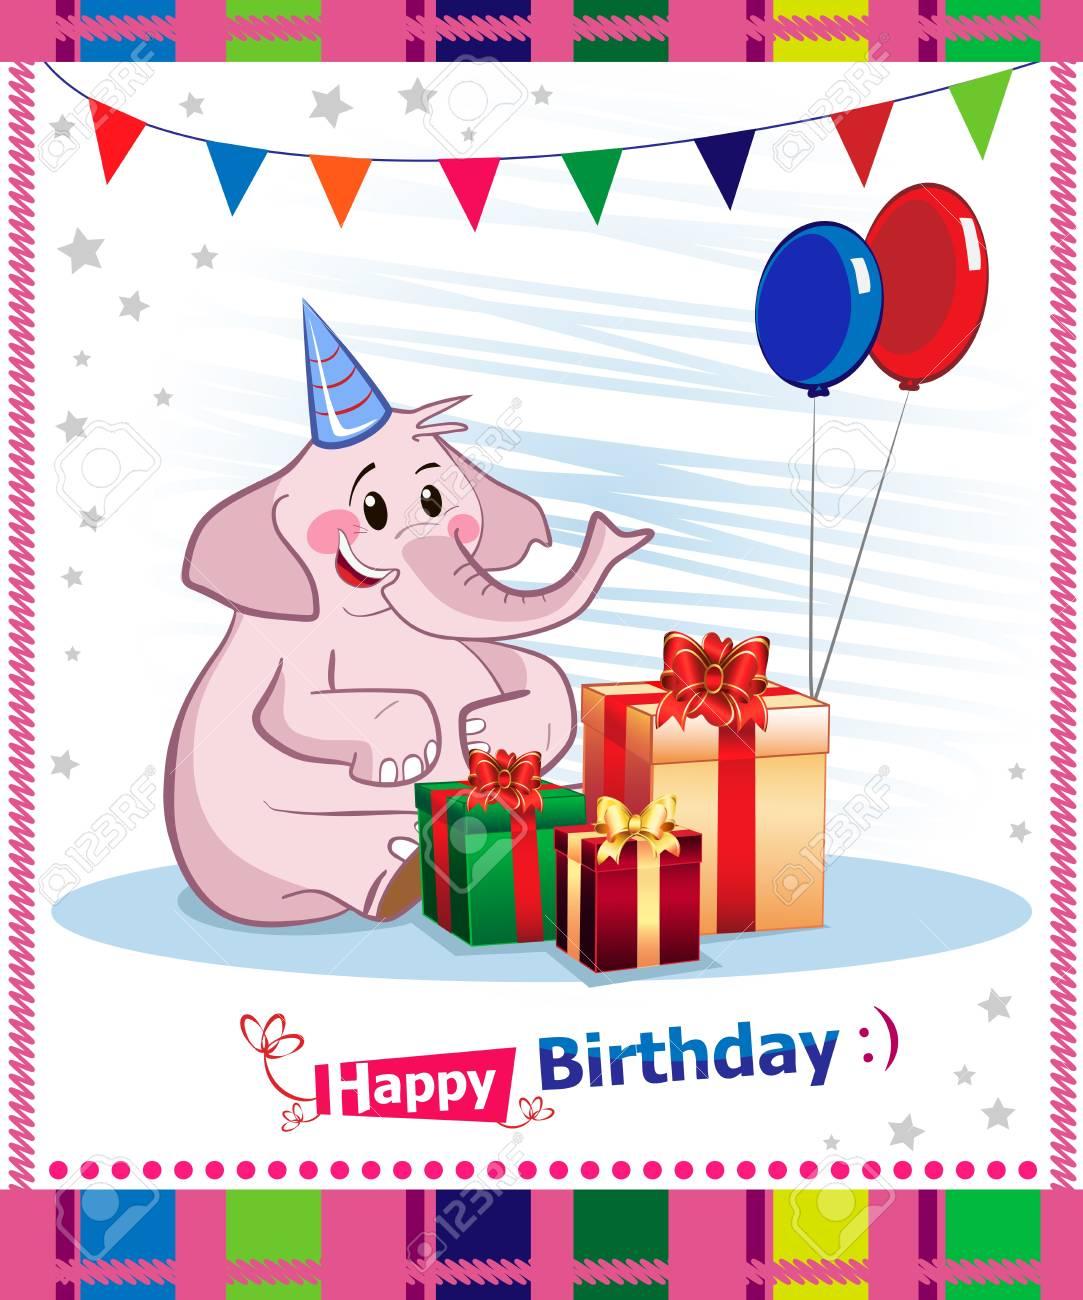 Happy birthday card design Stock Vector - 16882399